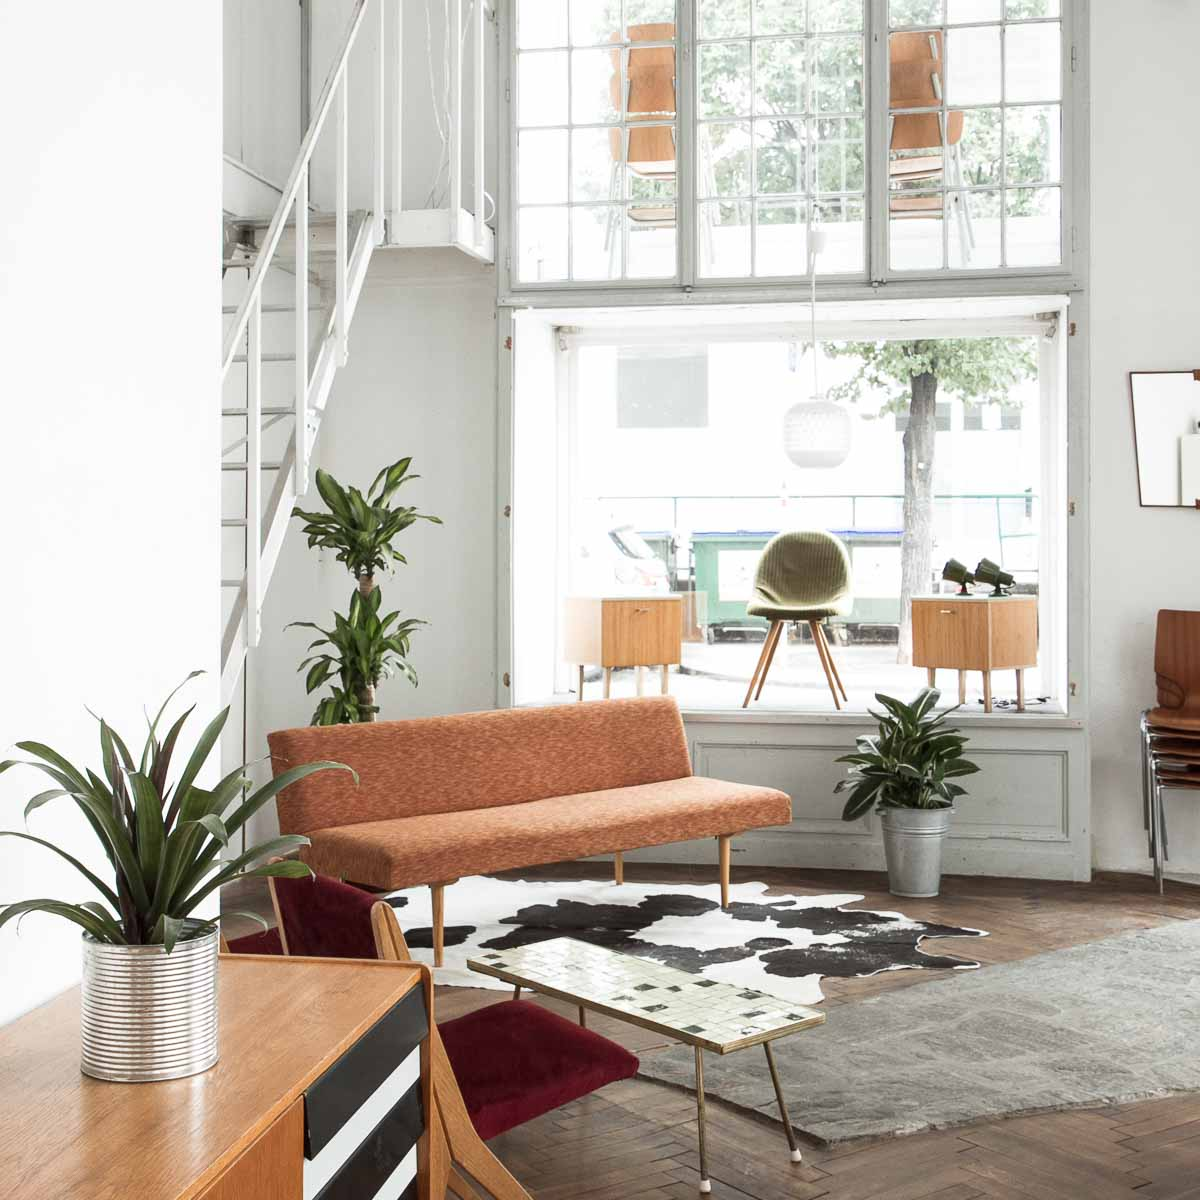 Vintage Möbel bei Die Wohnung in Wien